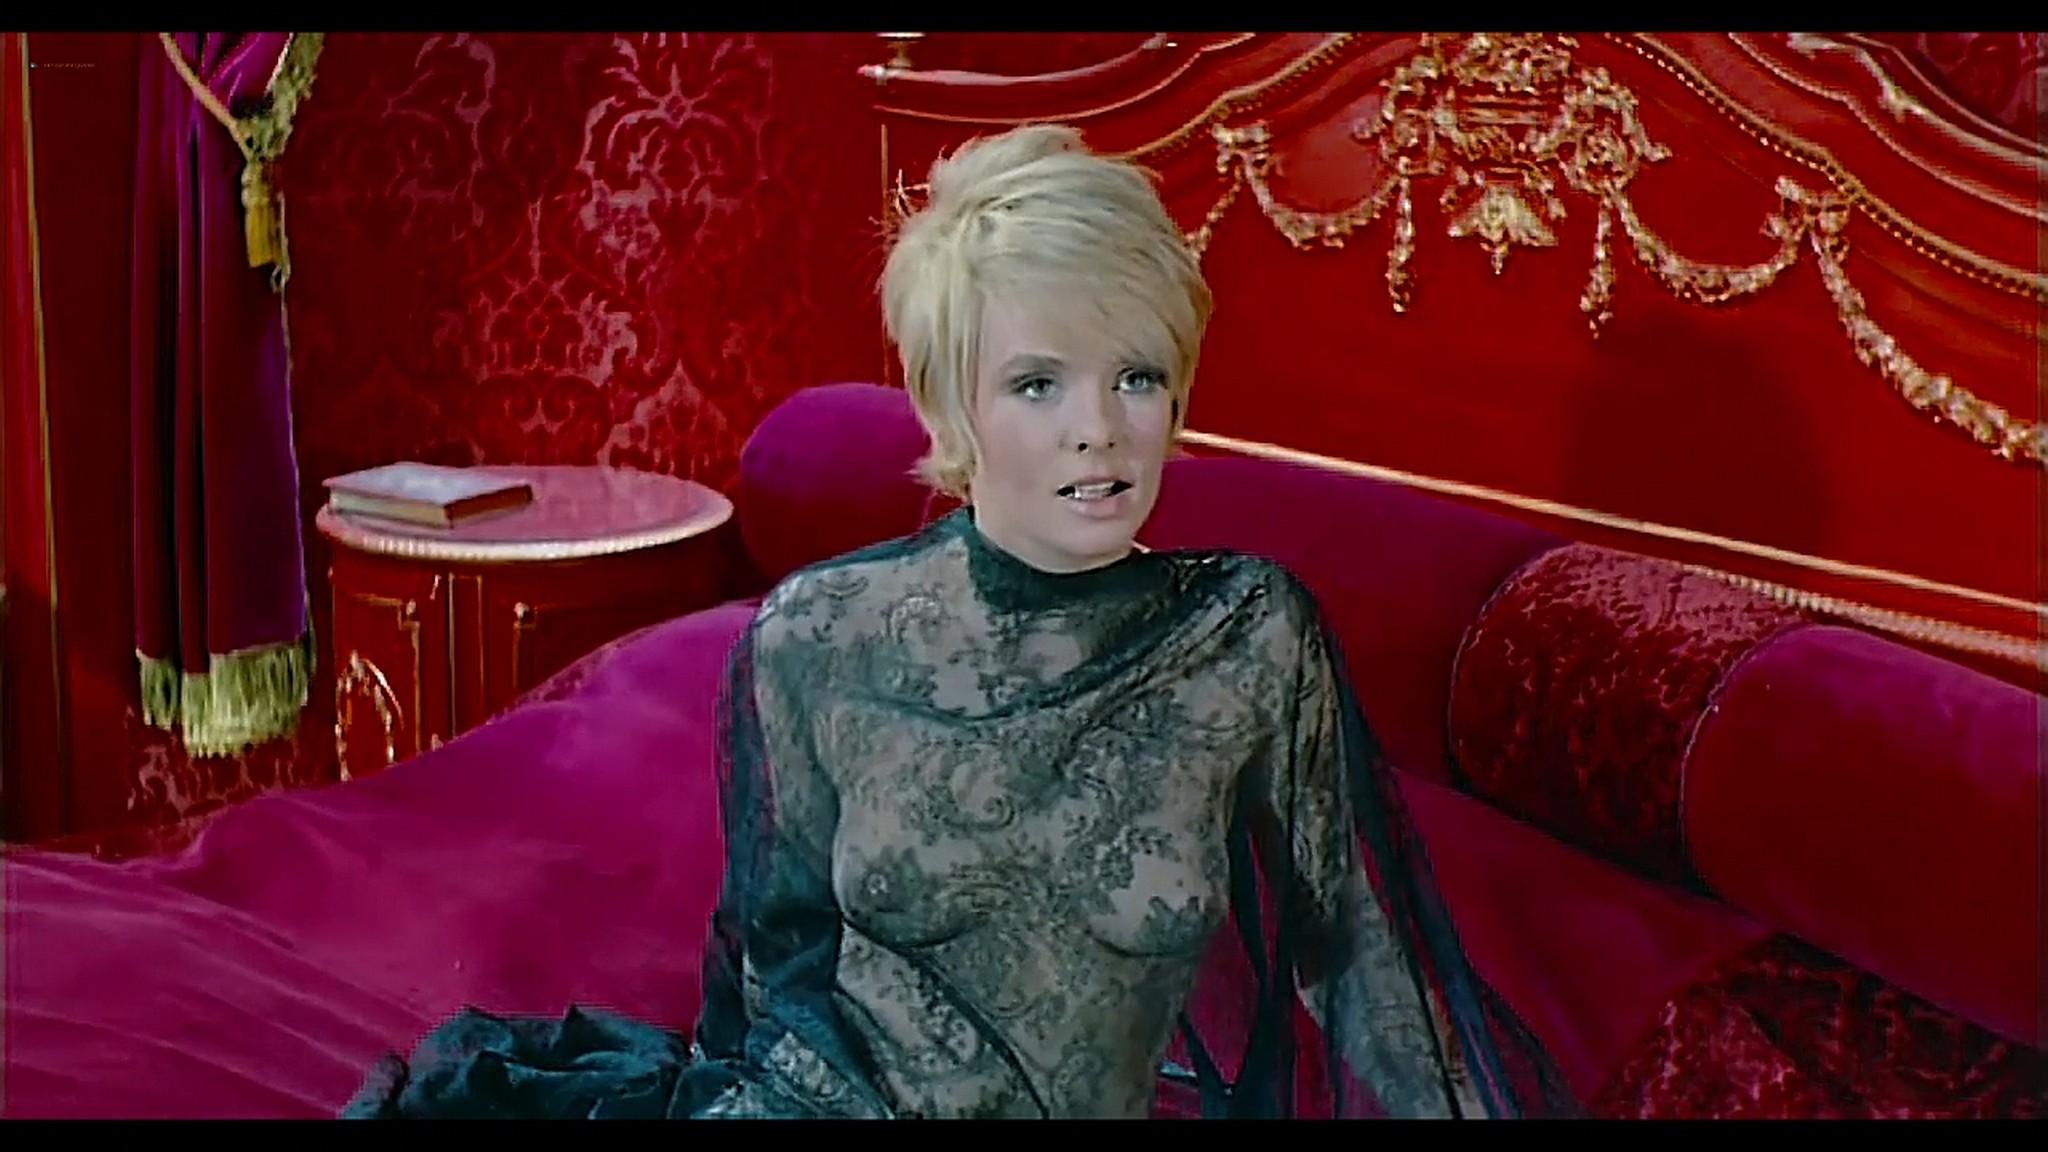 Joey Heatherton nude topless Sybil Danning Karin Schubert and others nude Bluebeard 1972 720p 03